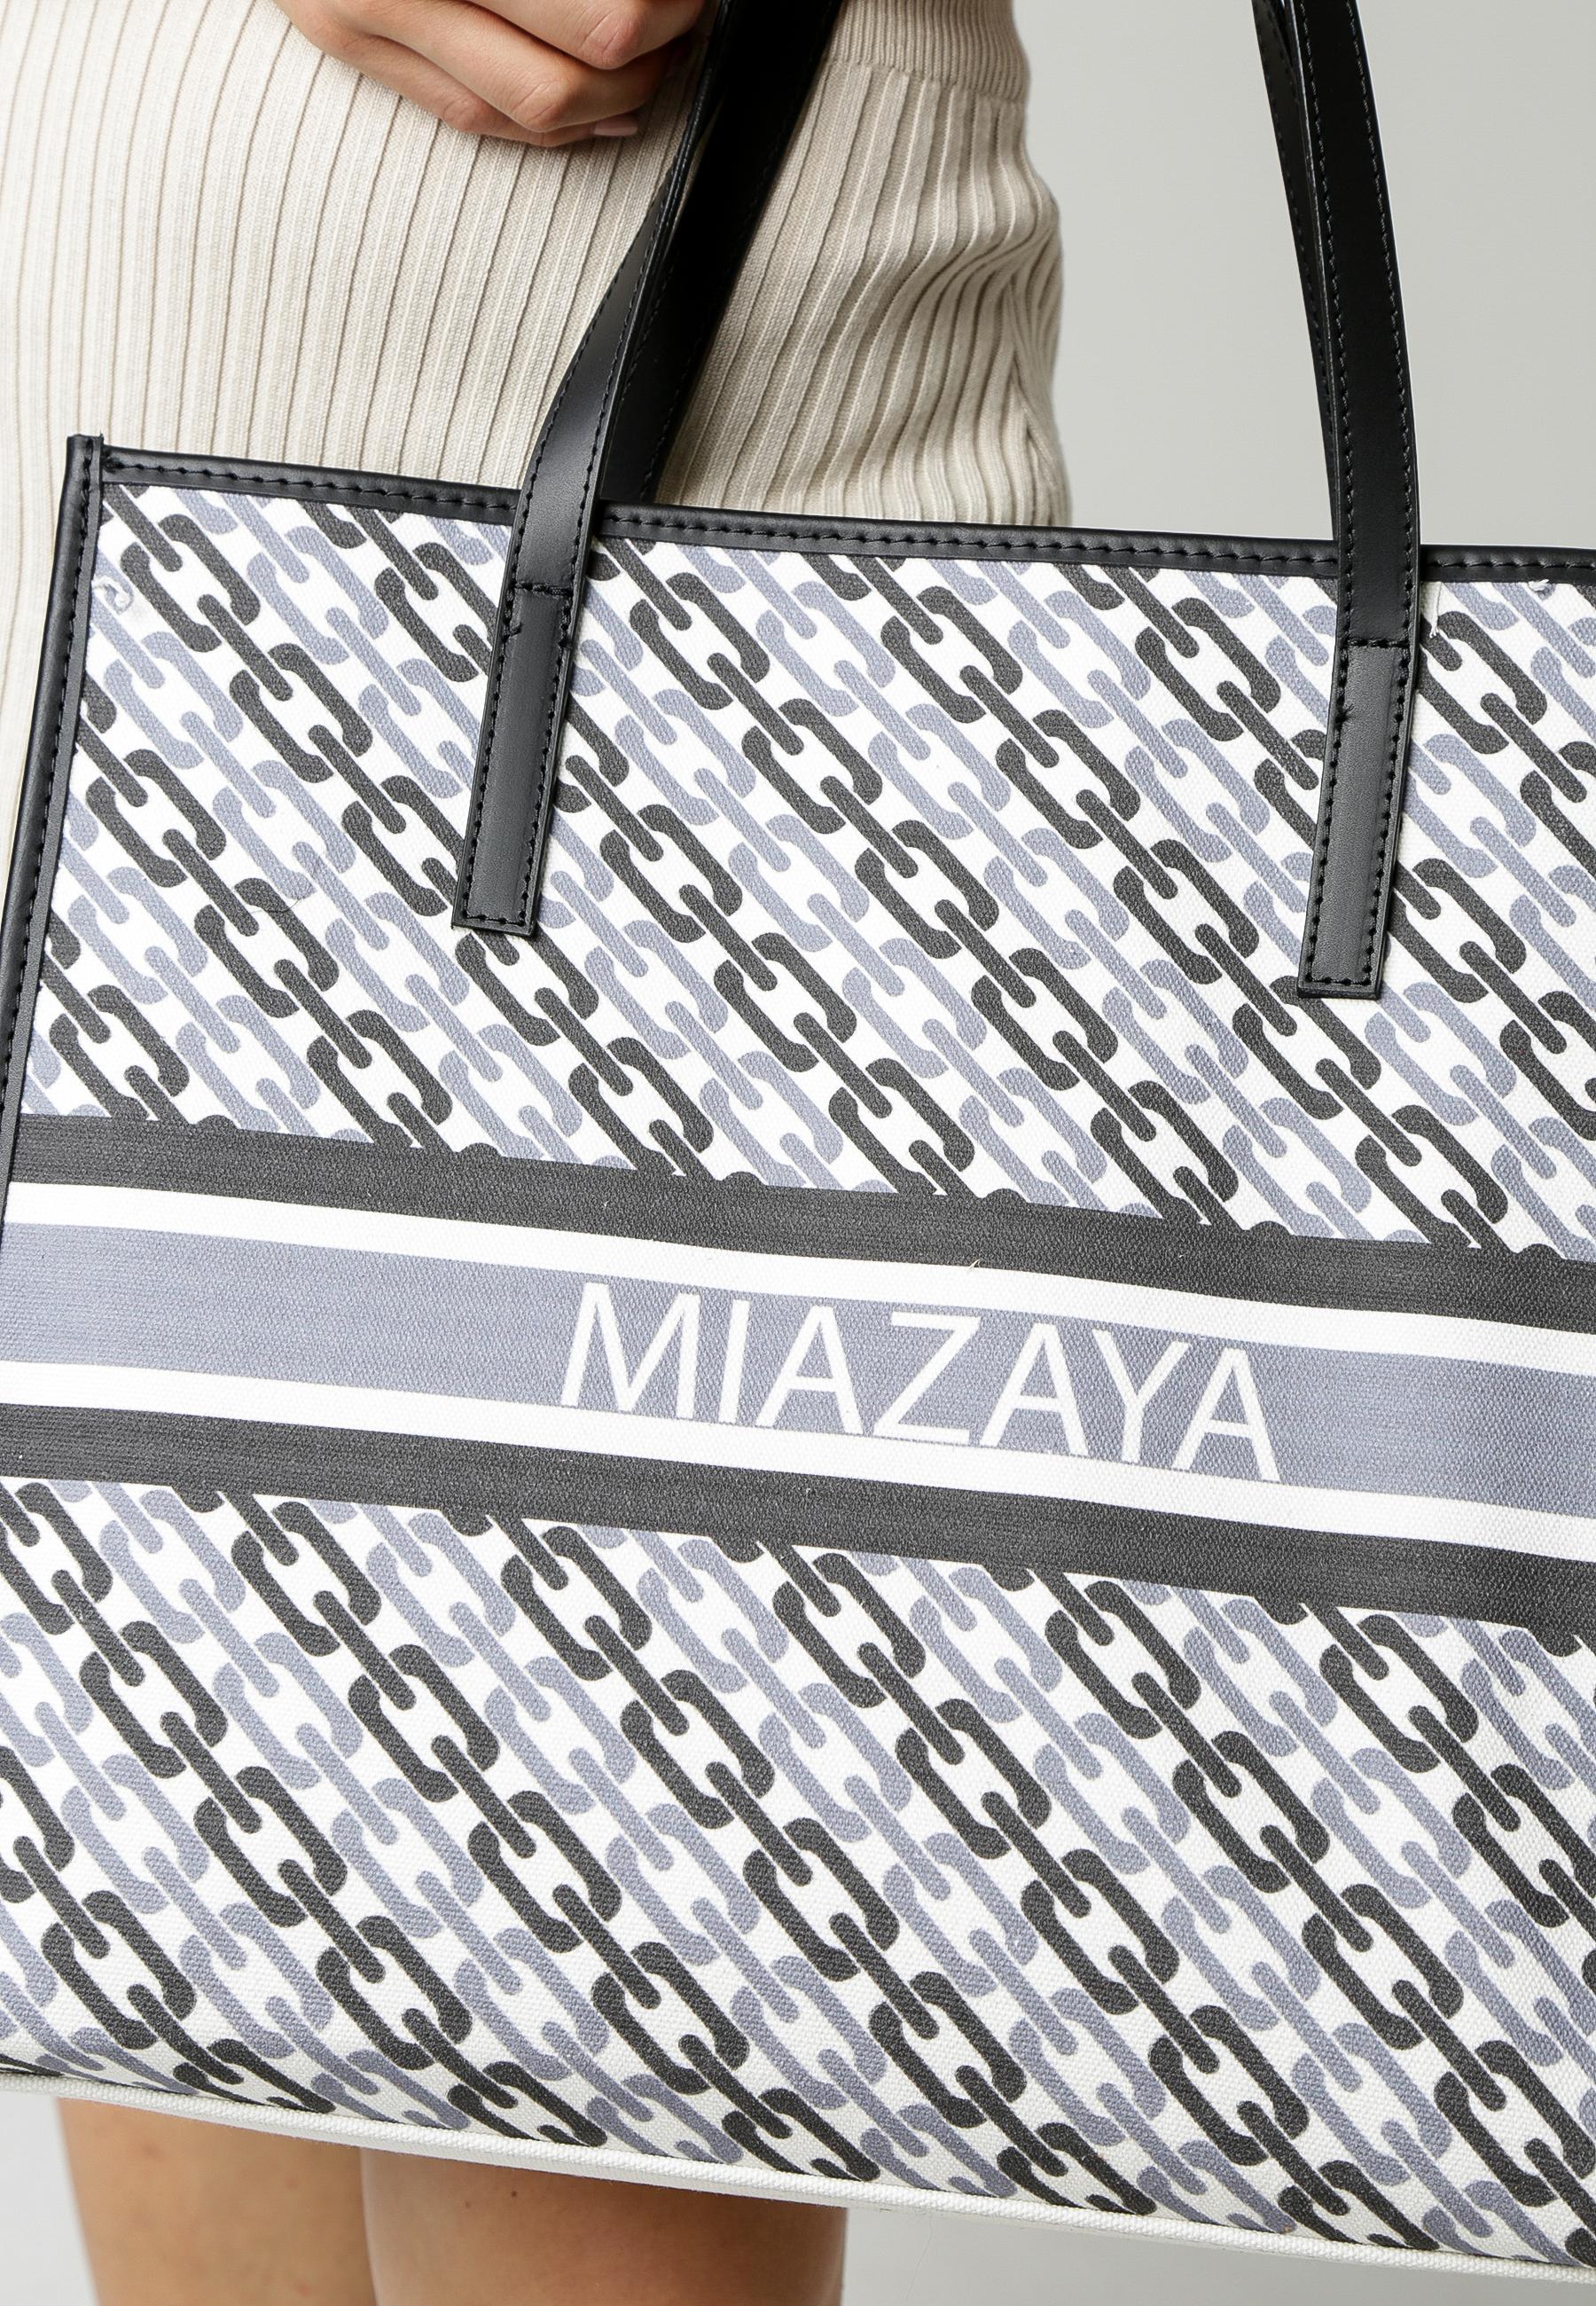 MiaZAYA Shopper